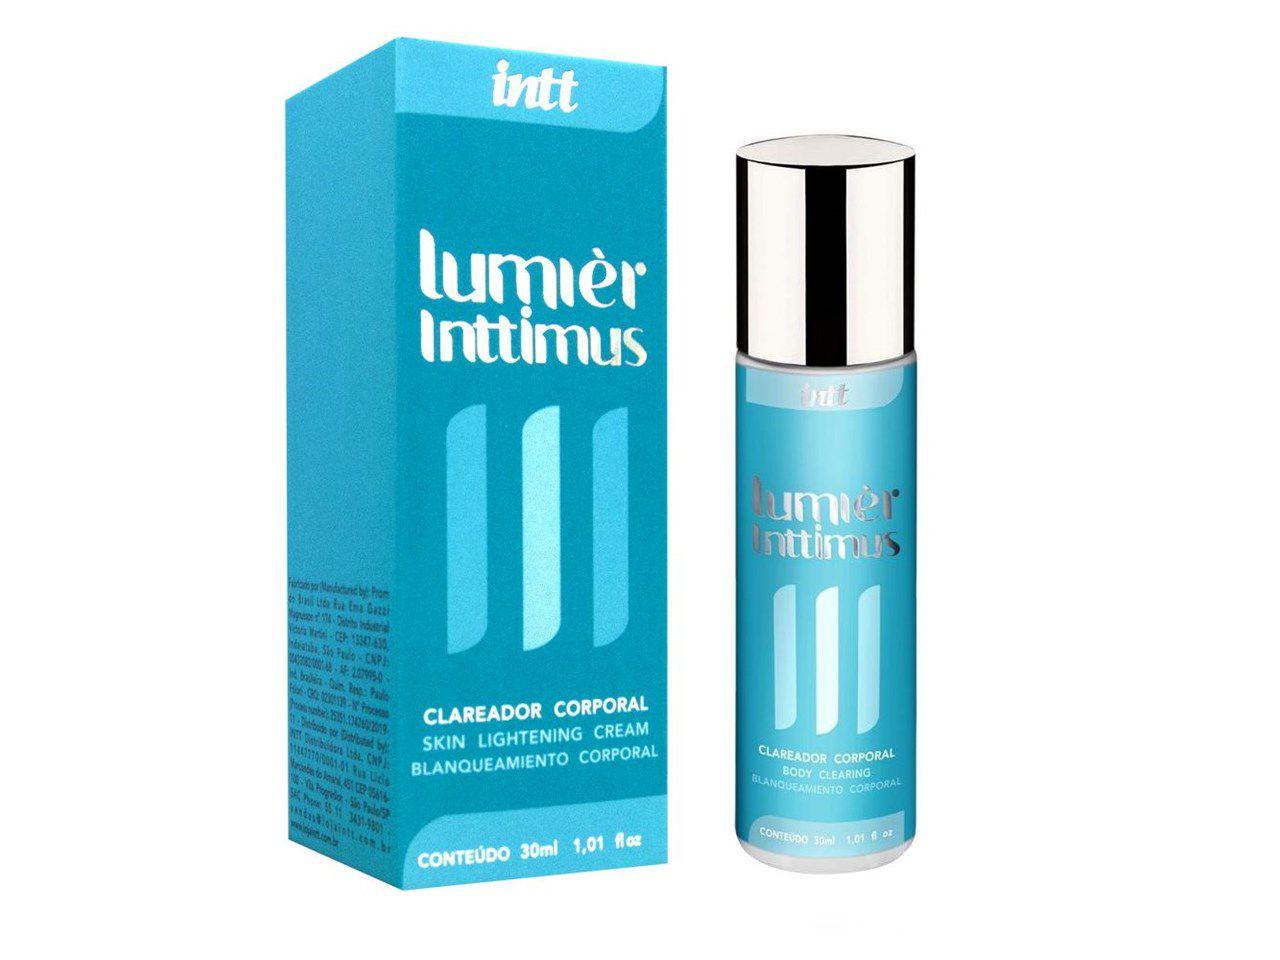 Creme clareador corporal Lumier Inttimus 30 ml